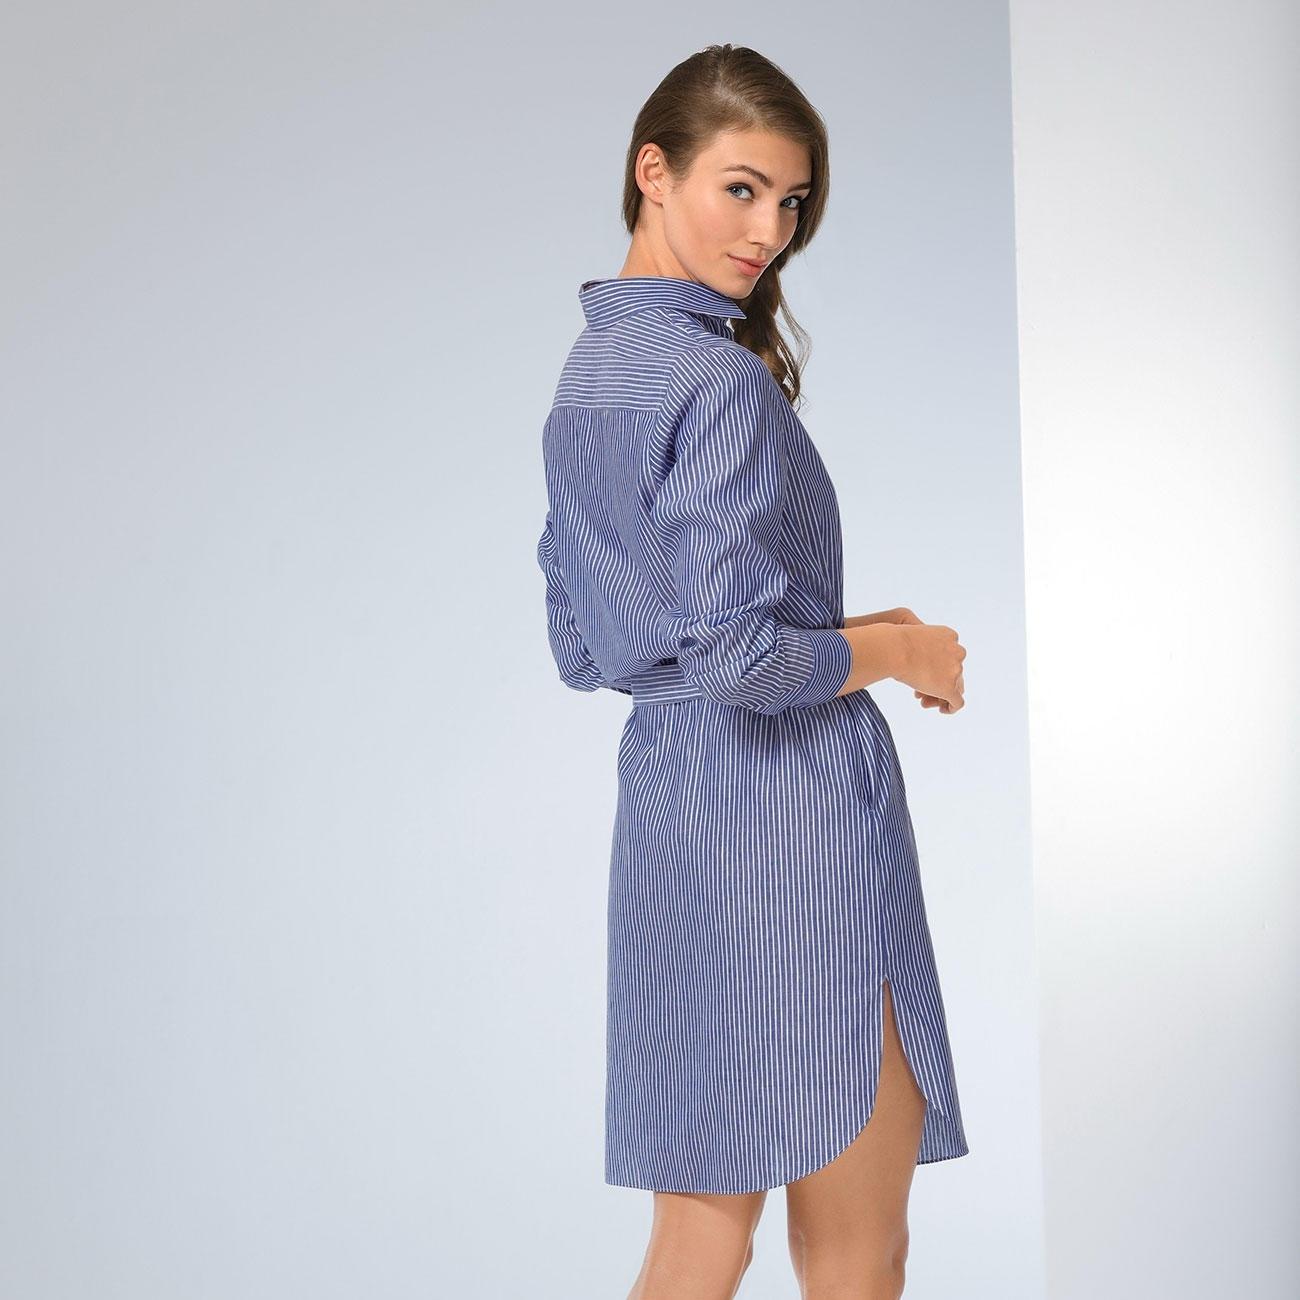 17 Luxurius Hemdblusenkleid Gr 50 StylishFormal Genial Hemdblusenkleid Gr 50 Boutique